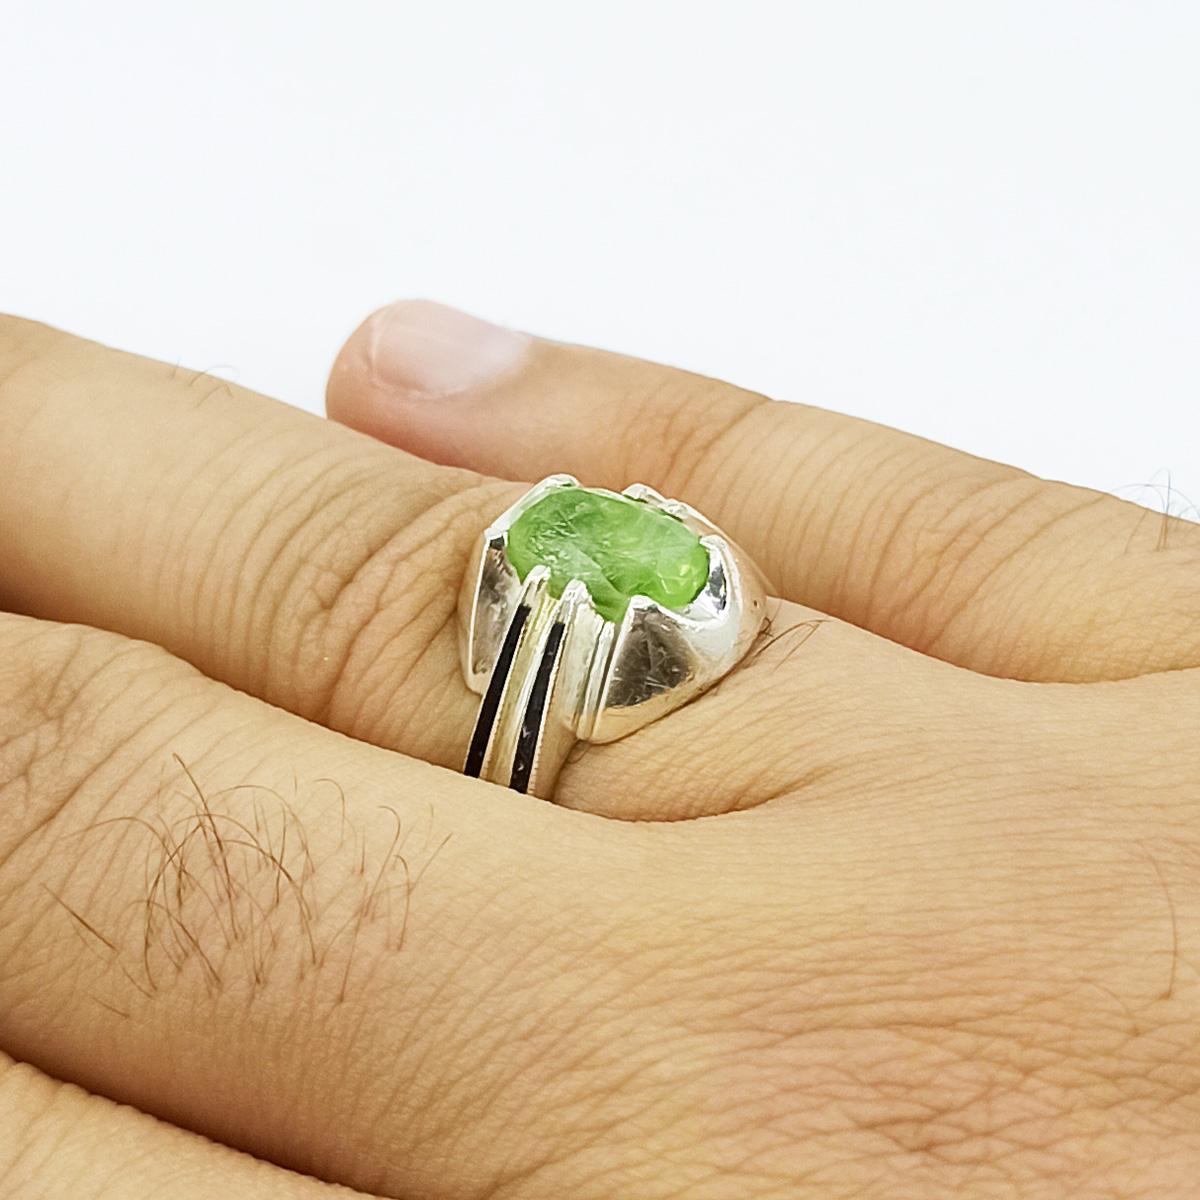 انگشتر نقره مردانه سلین کالا مدل زبرجد ce-As174